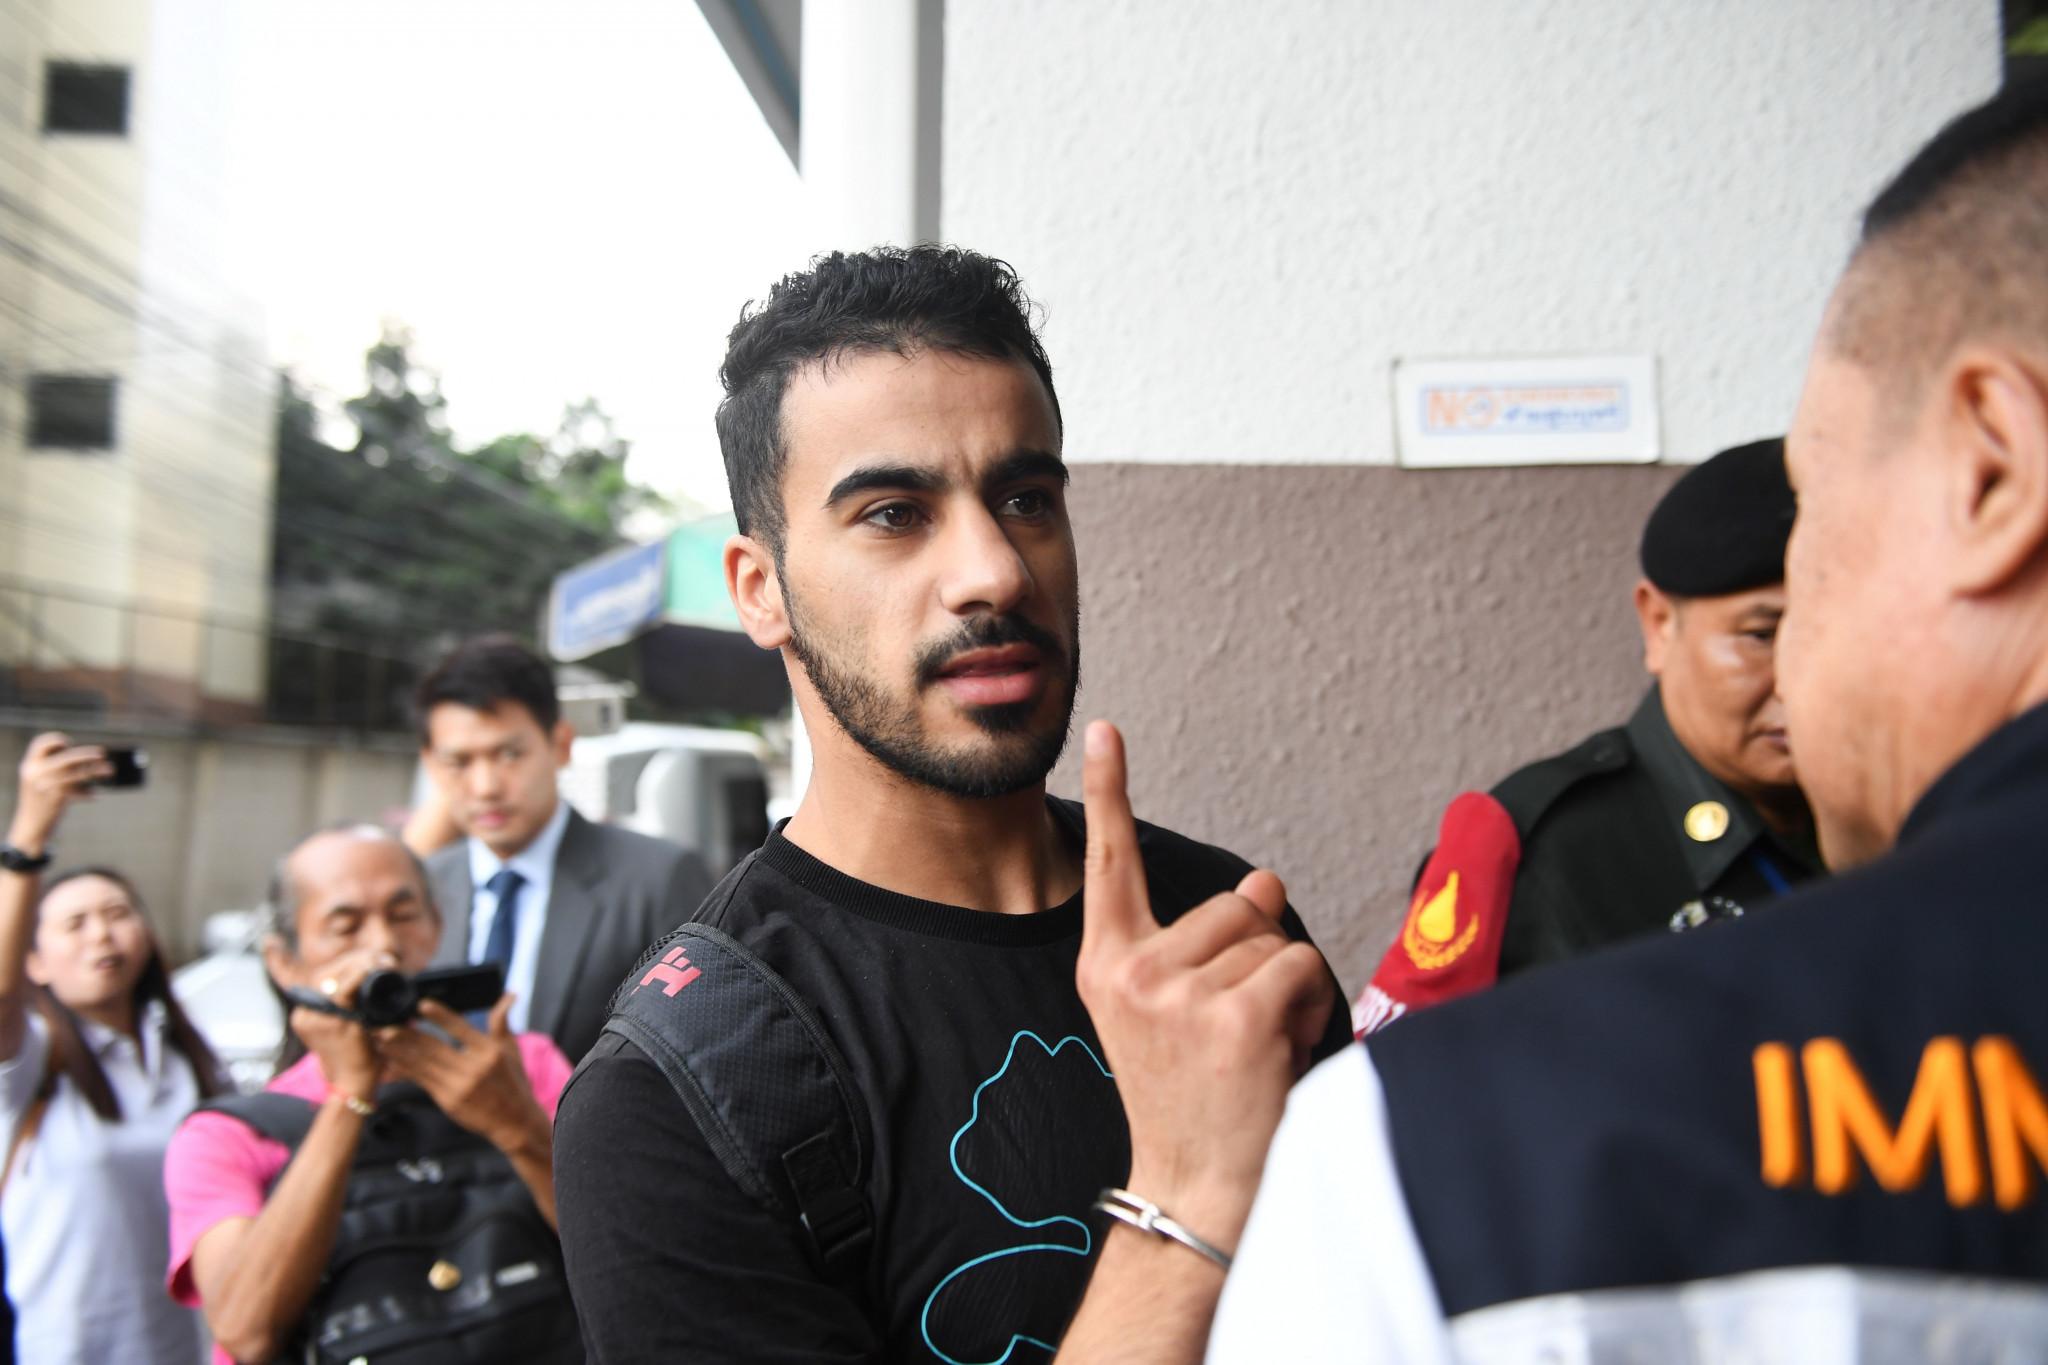 Thailand may soon extradite Hakeem al-Araibi back to Bahrain despite international calls not to do so